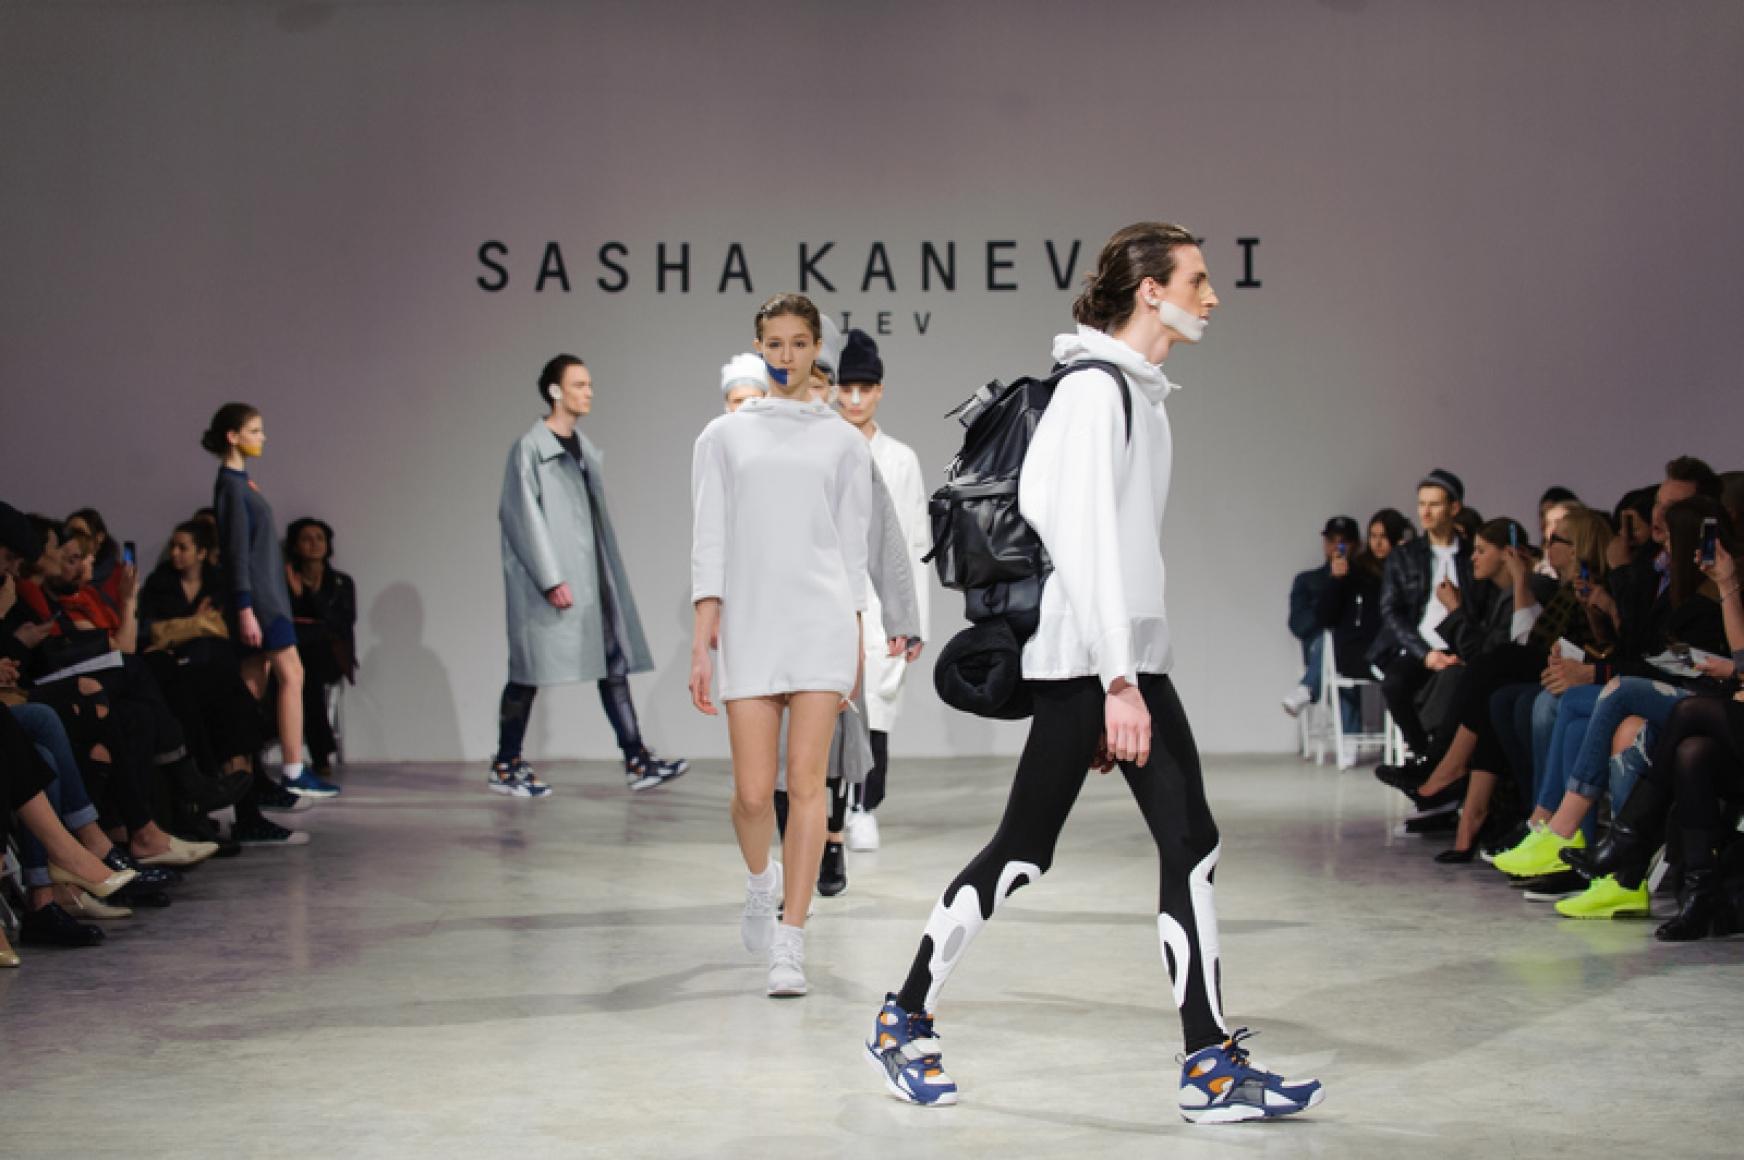 sasha.kanevki осень-зима 2015/2016 #1